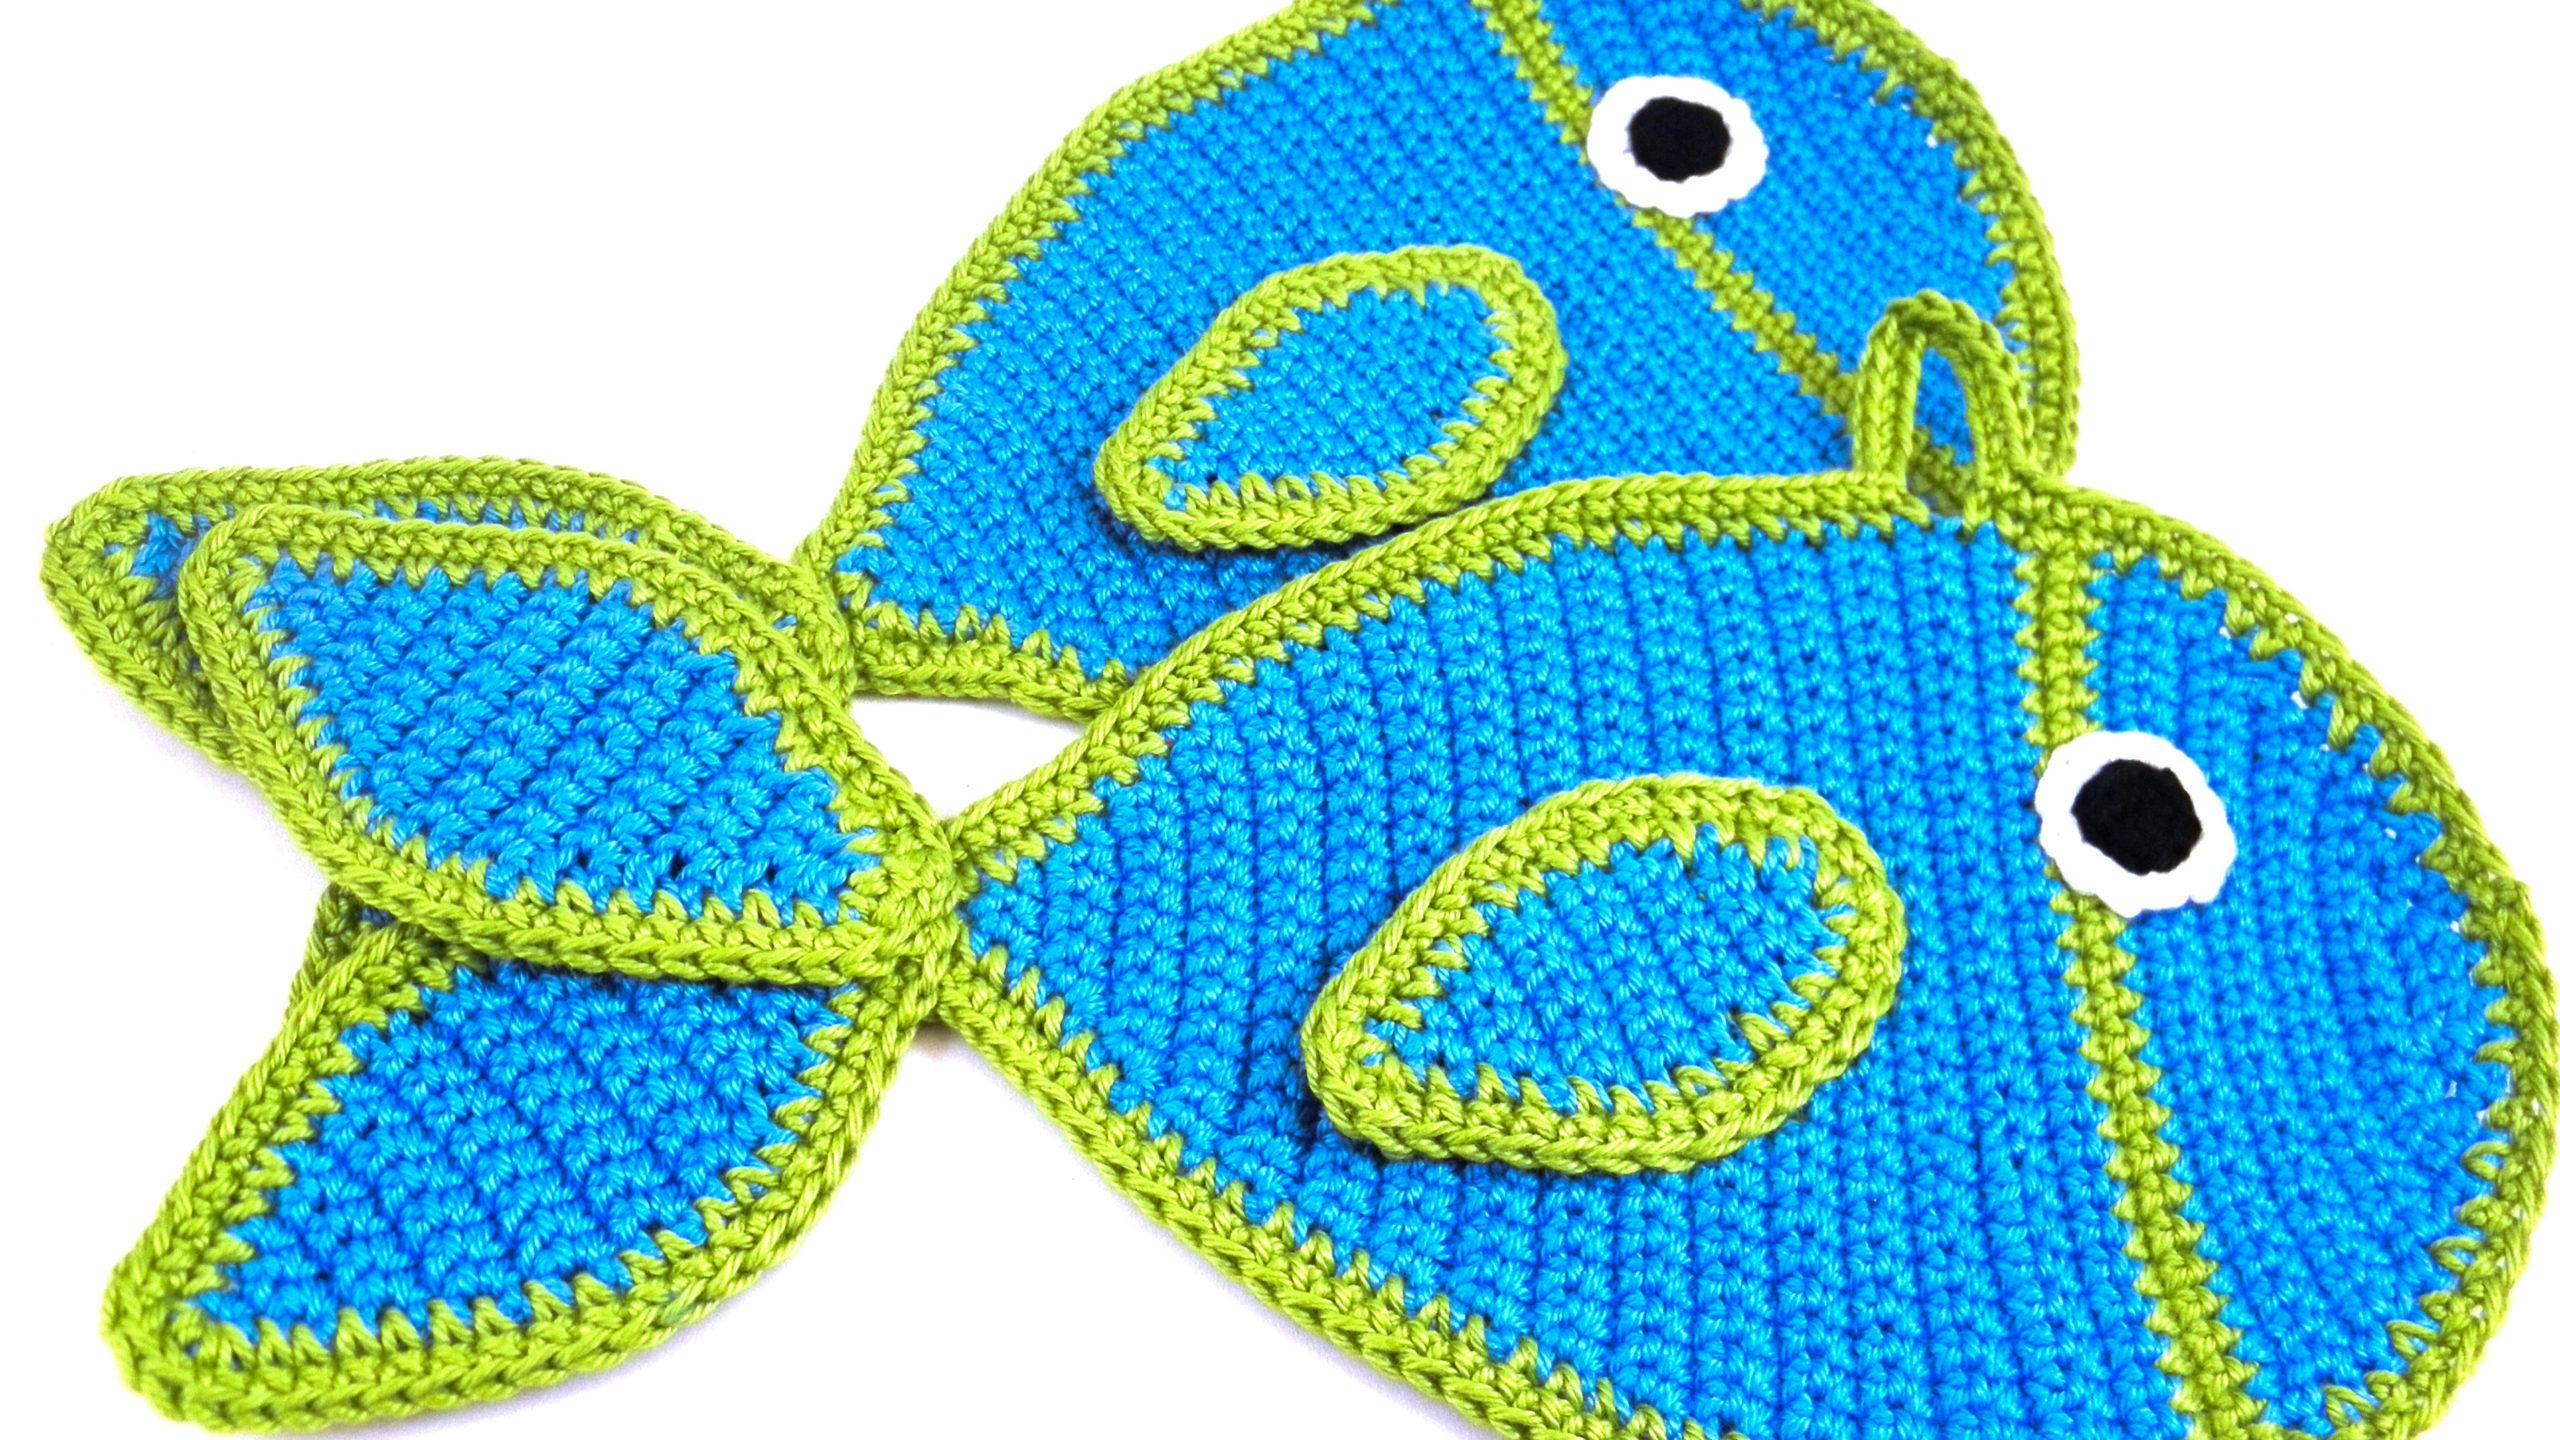 Pfiffigstes Häkelblog: Gratisanleitung, Auszug aus dem Fischbuch ... | 1440x2560